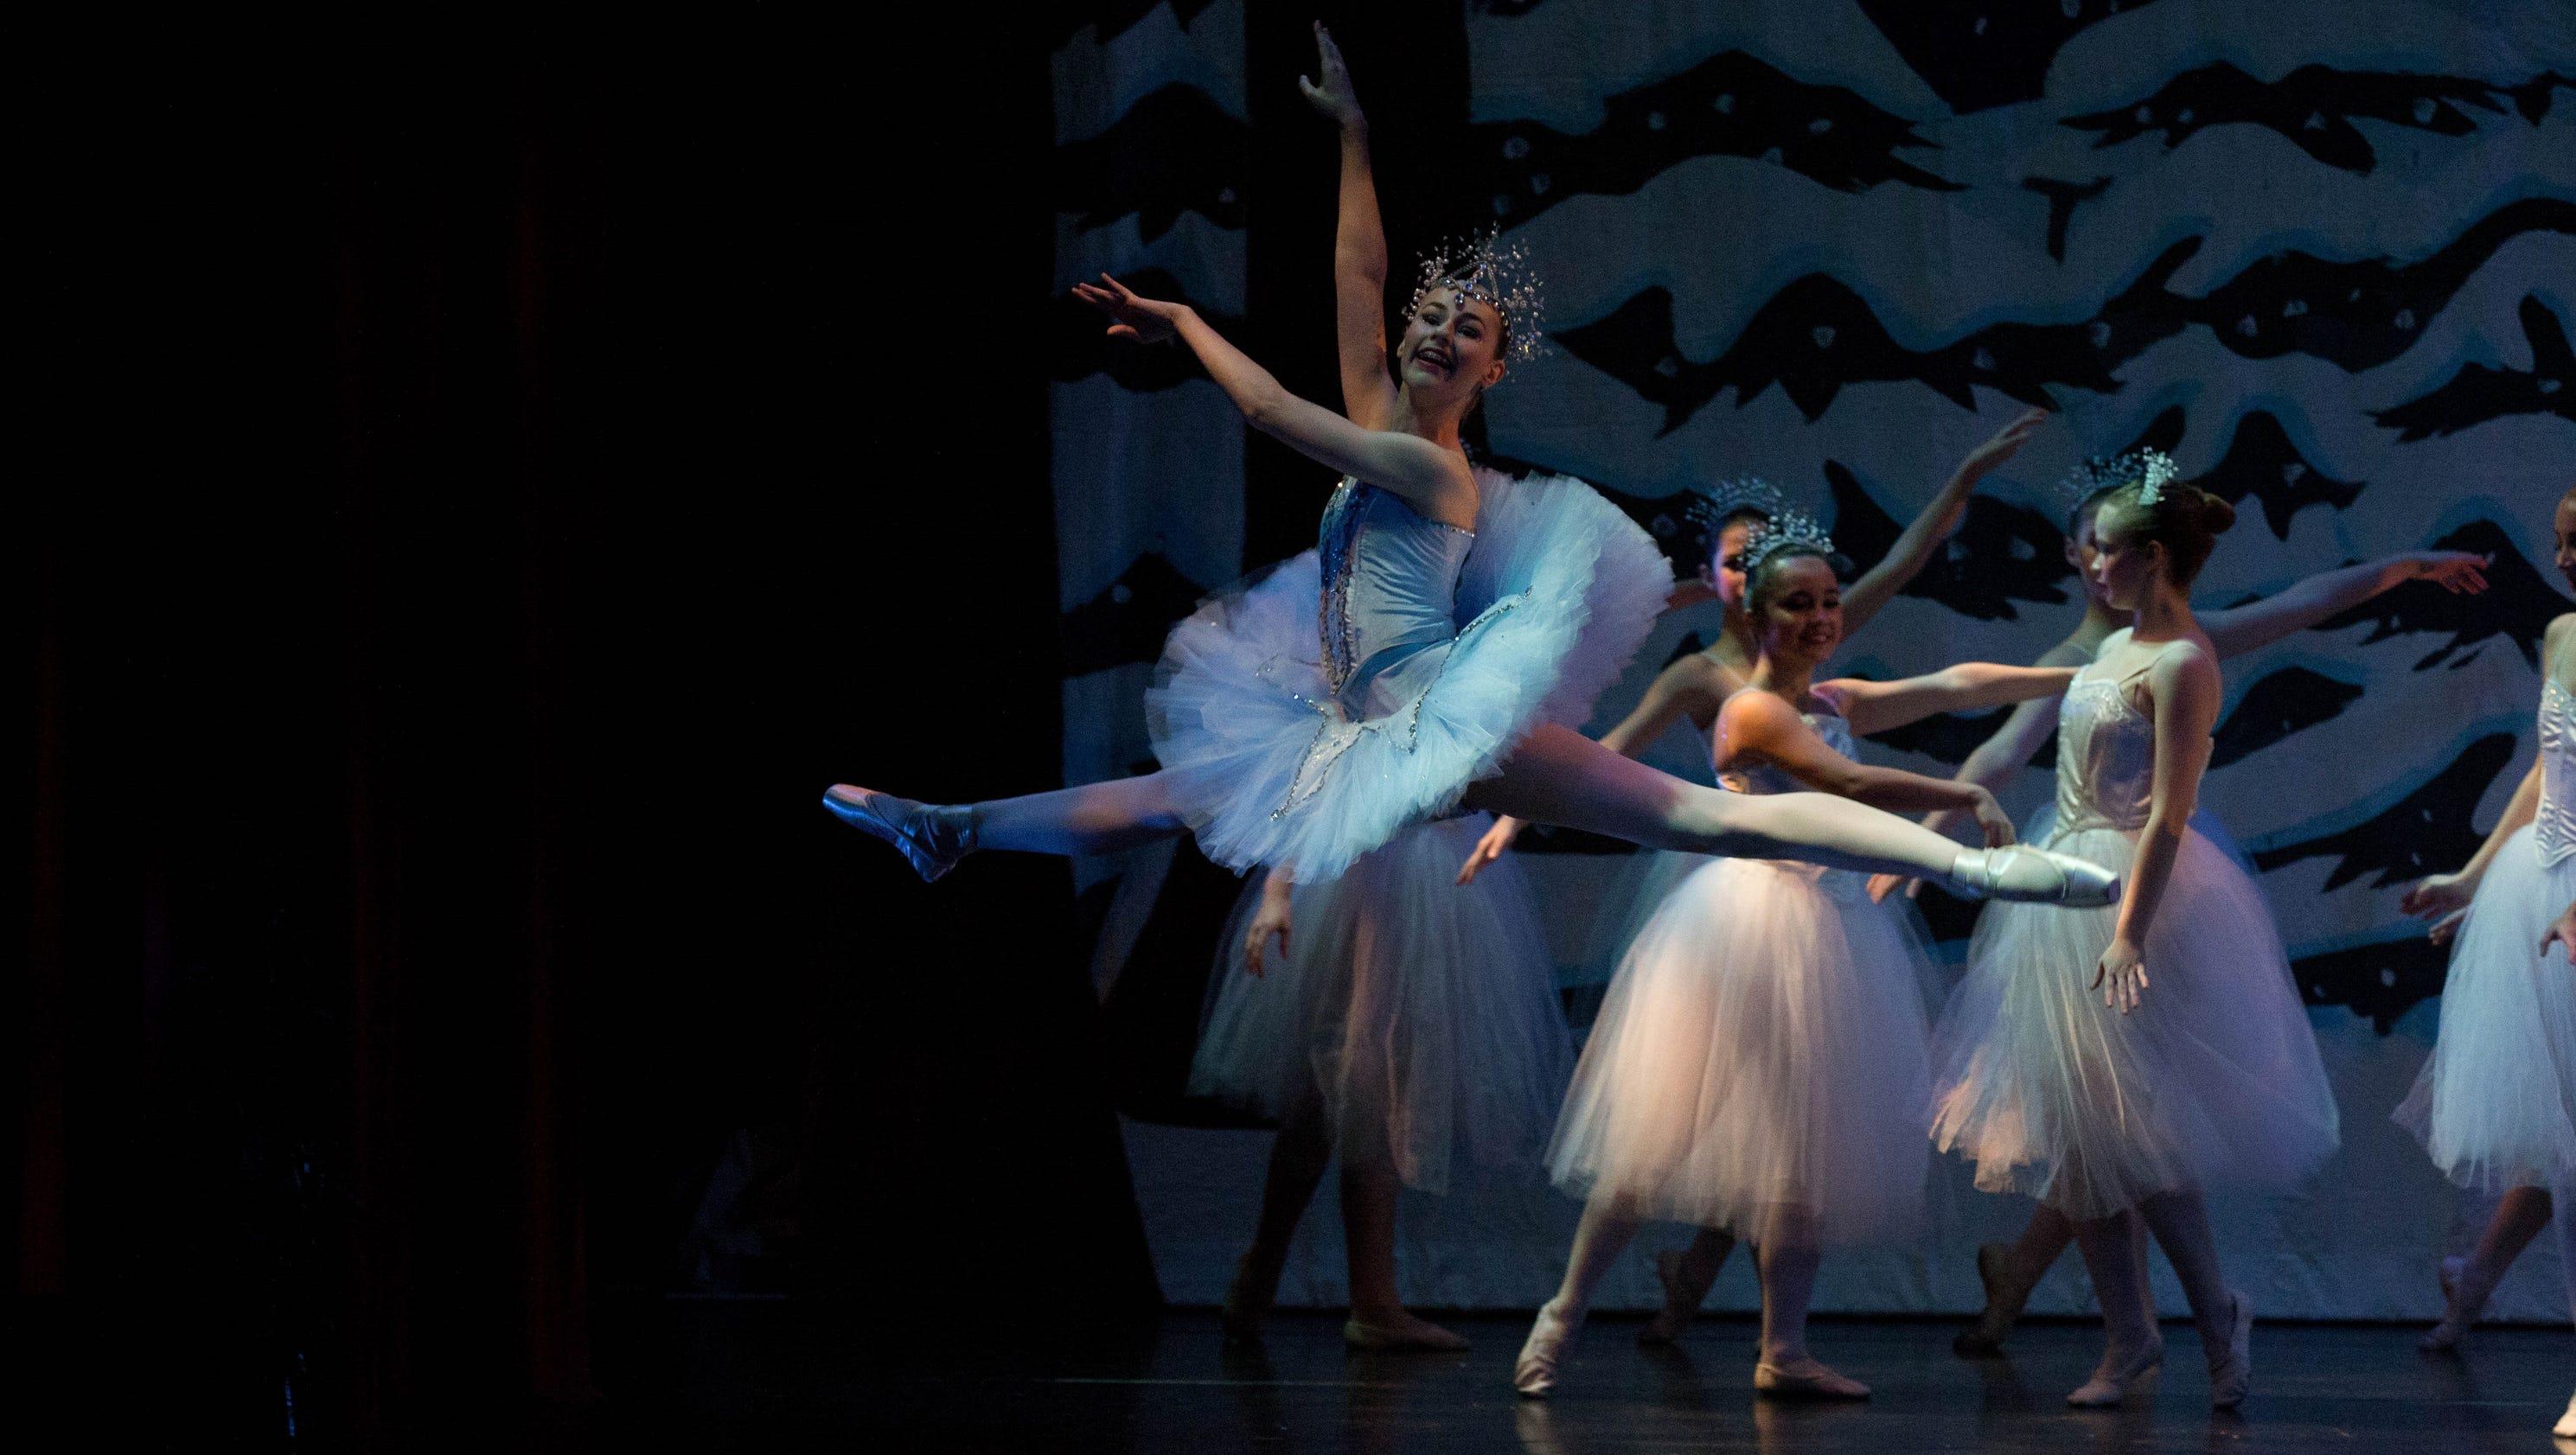 39 Peter Pan 39 Ballet Coming To Elsinore Theatre June 11